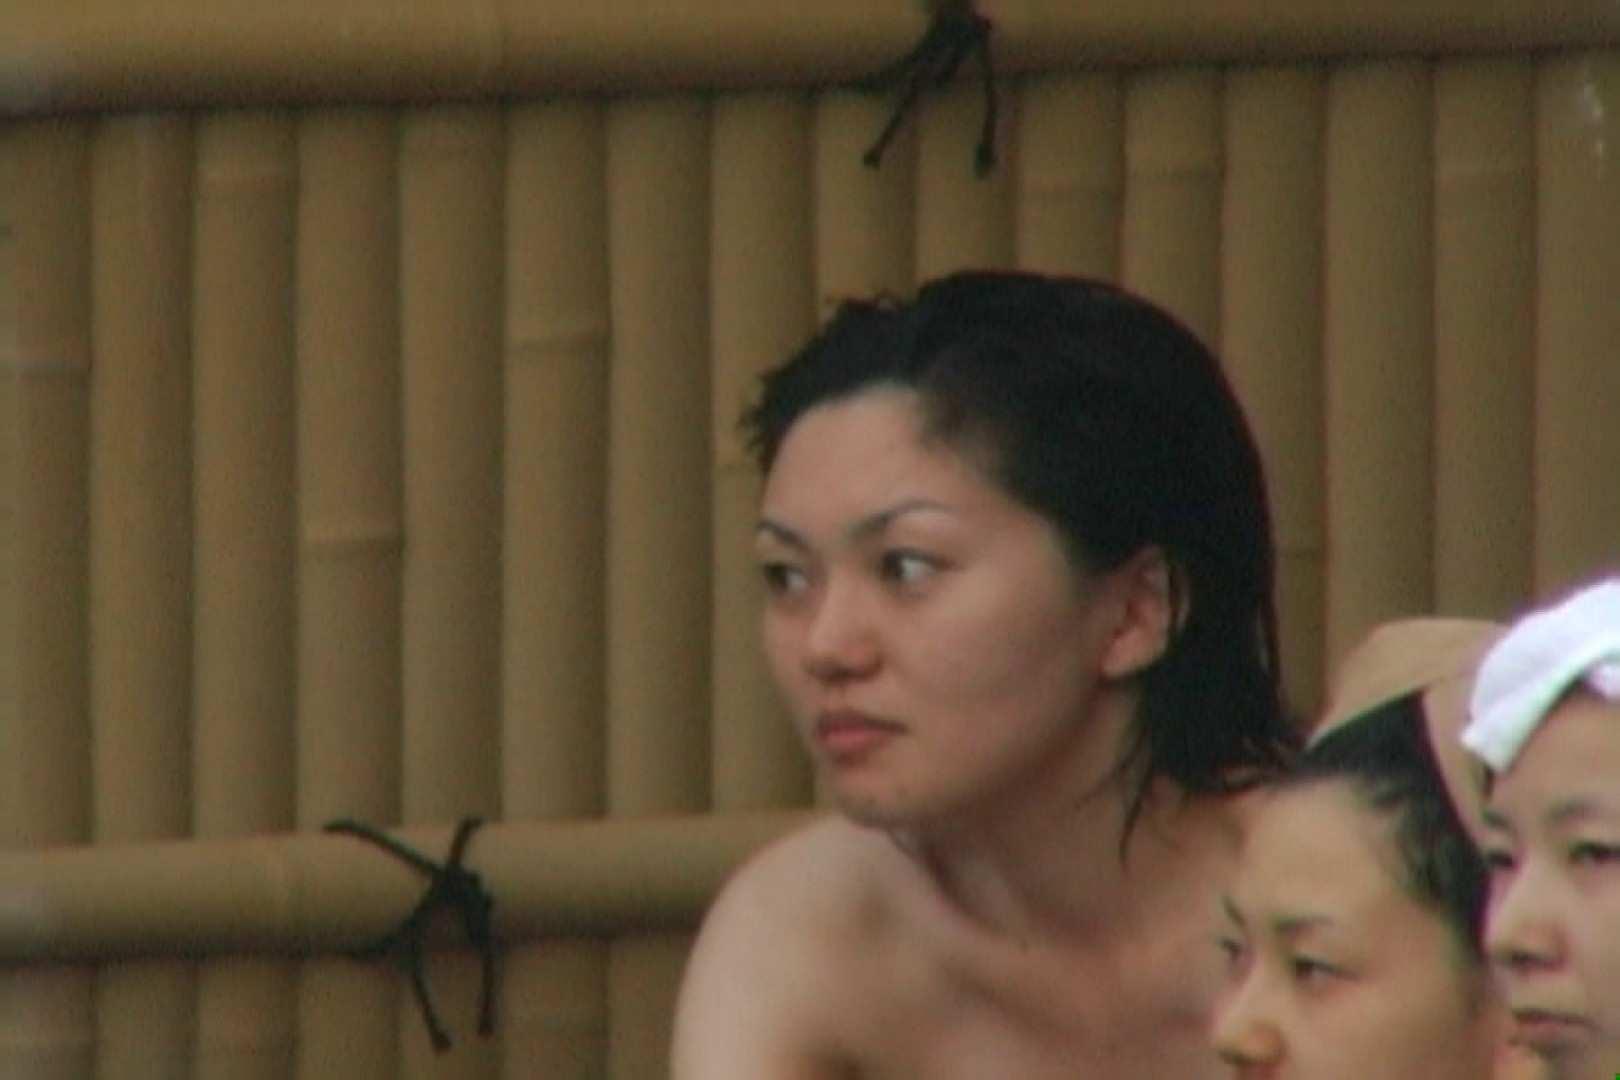 Aquaな露天風呂Vol.613 女体盗撮 盗撮戯れ無修正画像 43連発 32